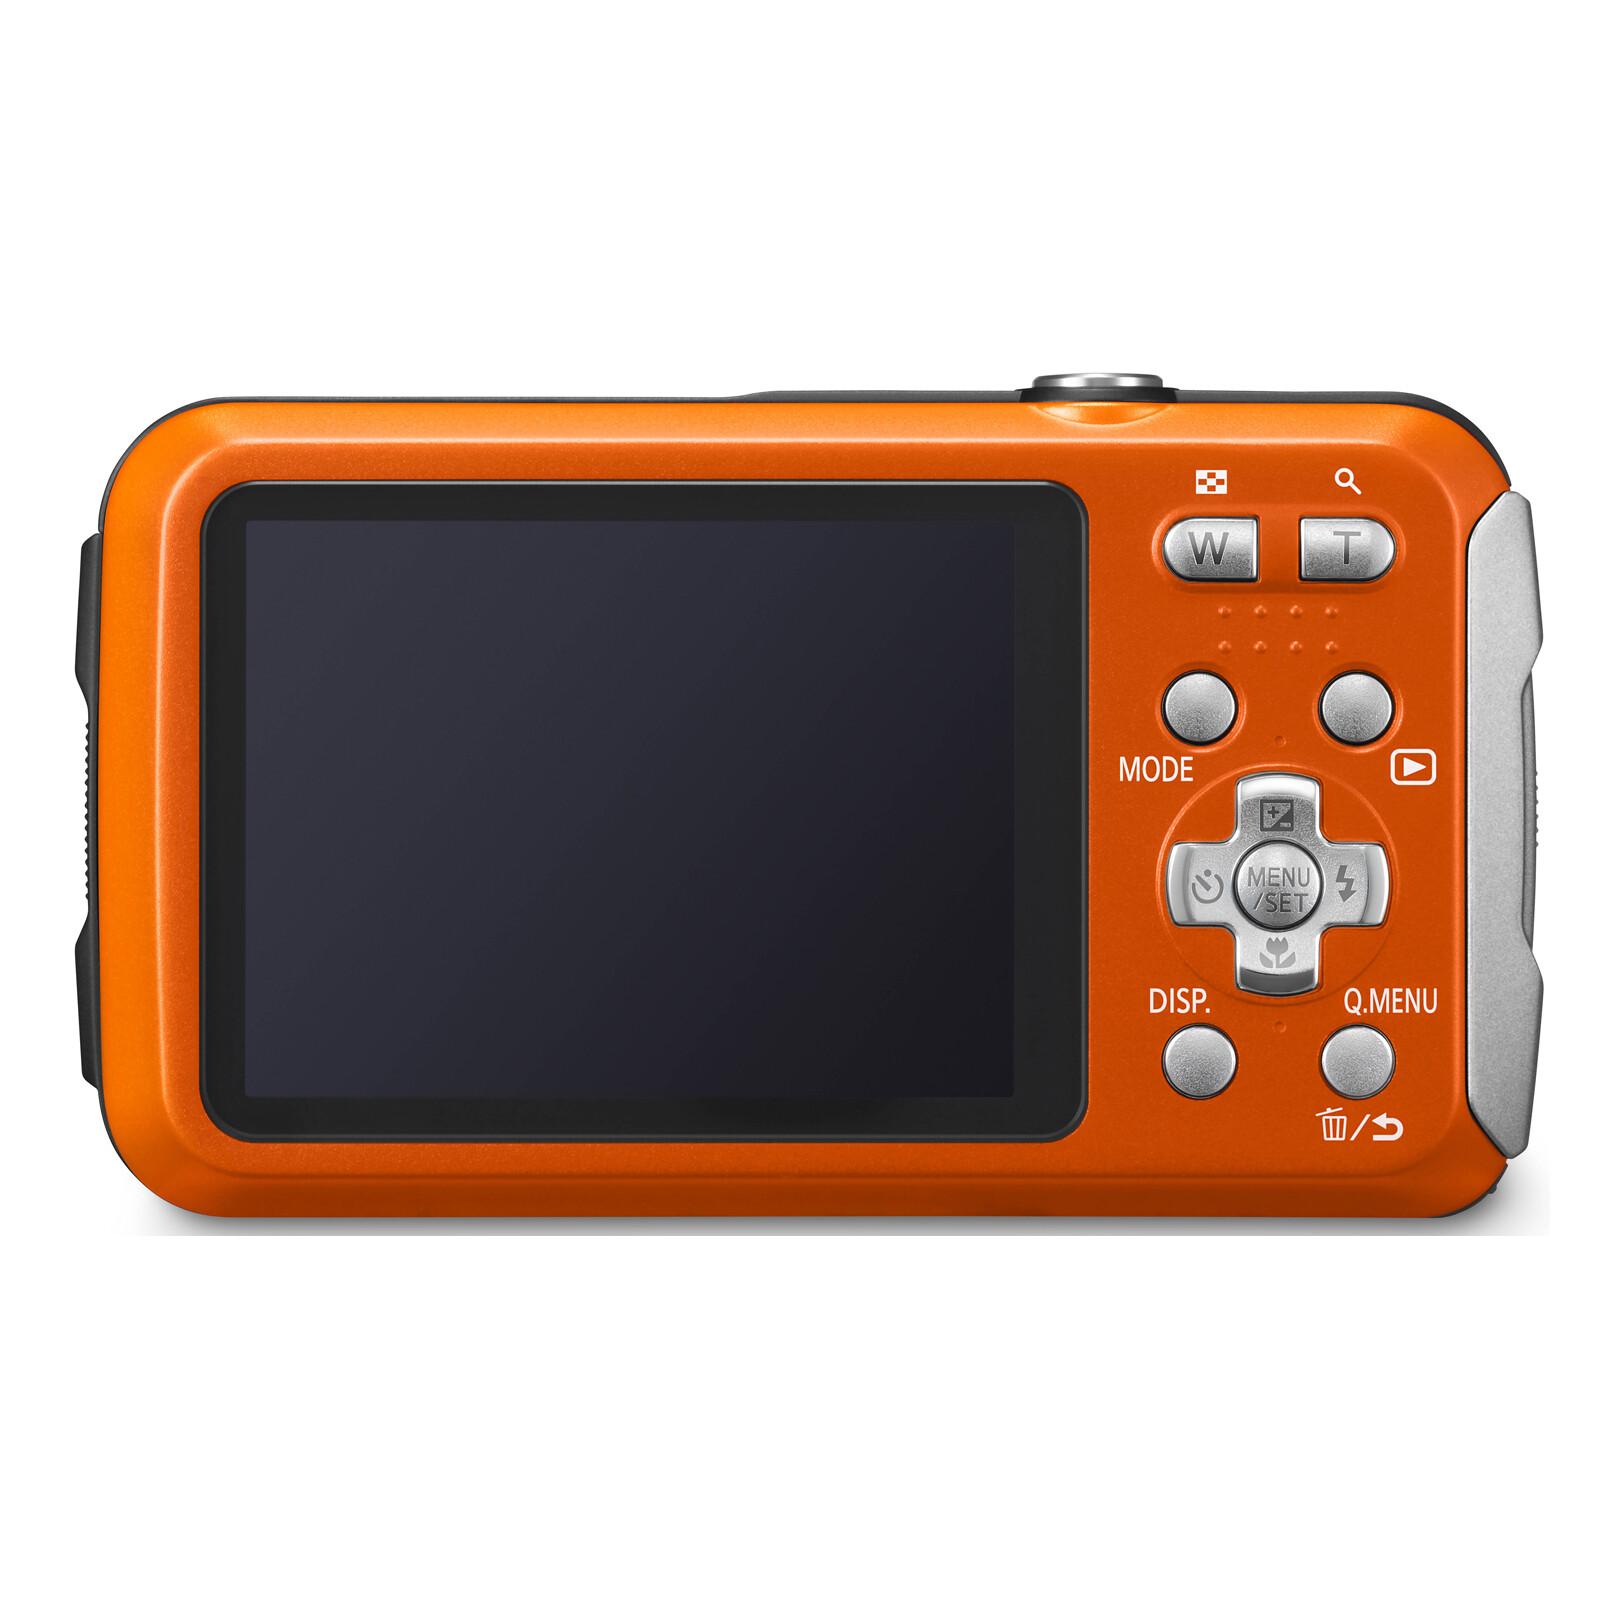 Panasonic DMC-FT30EG-D orange